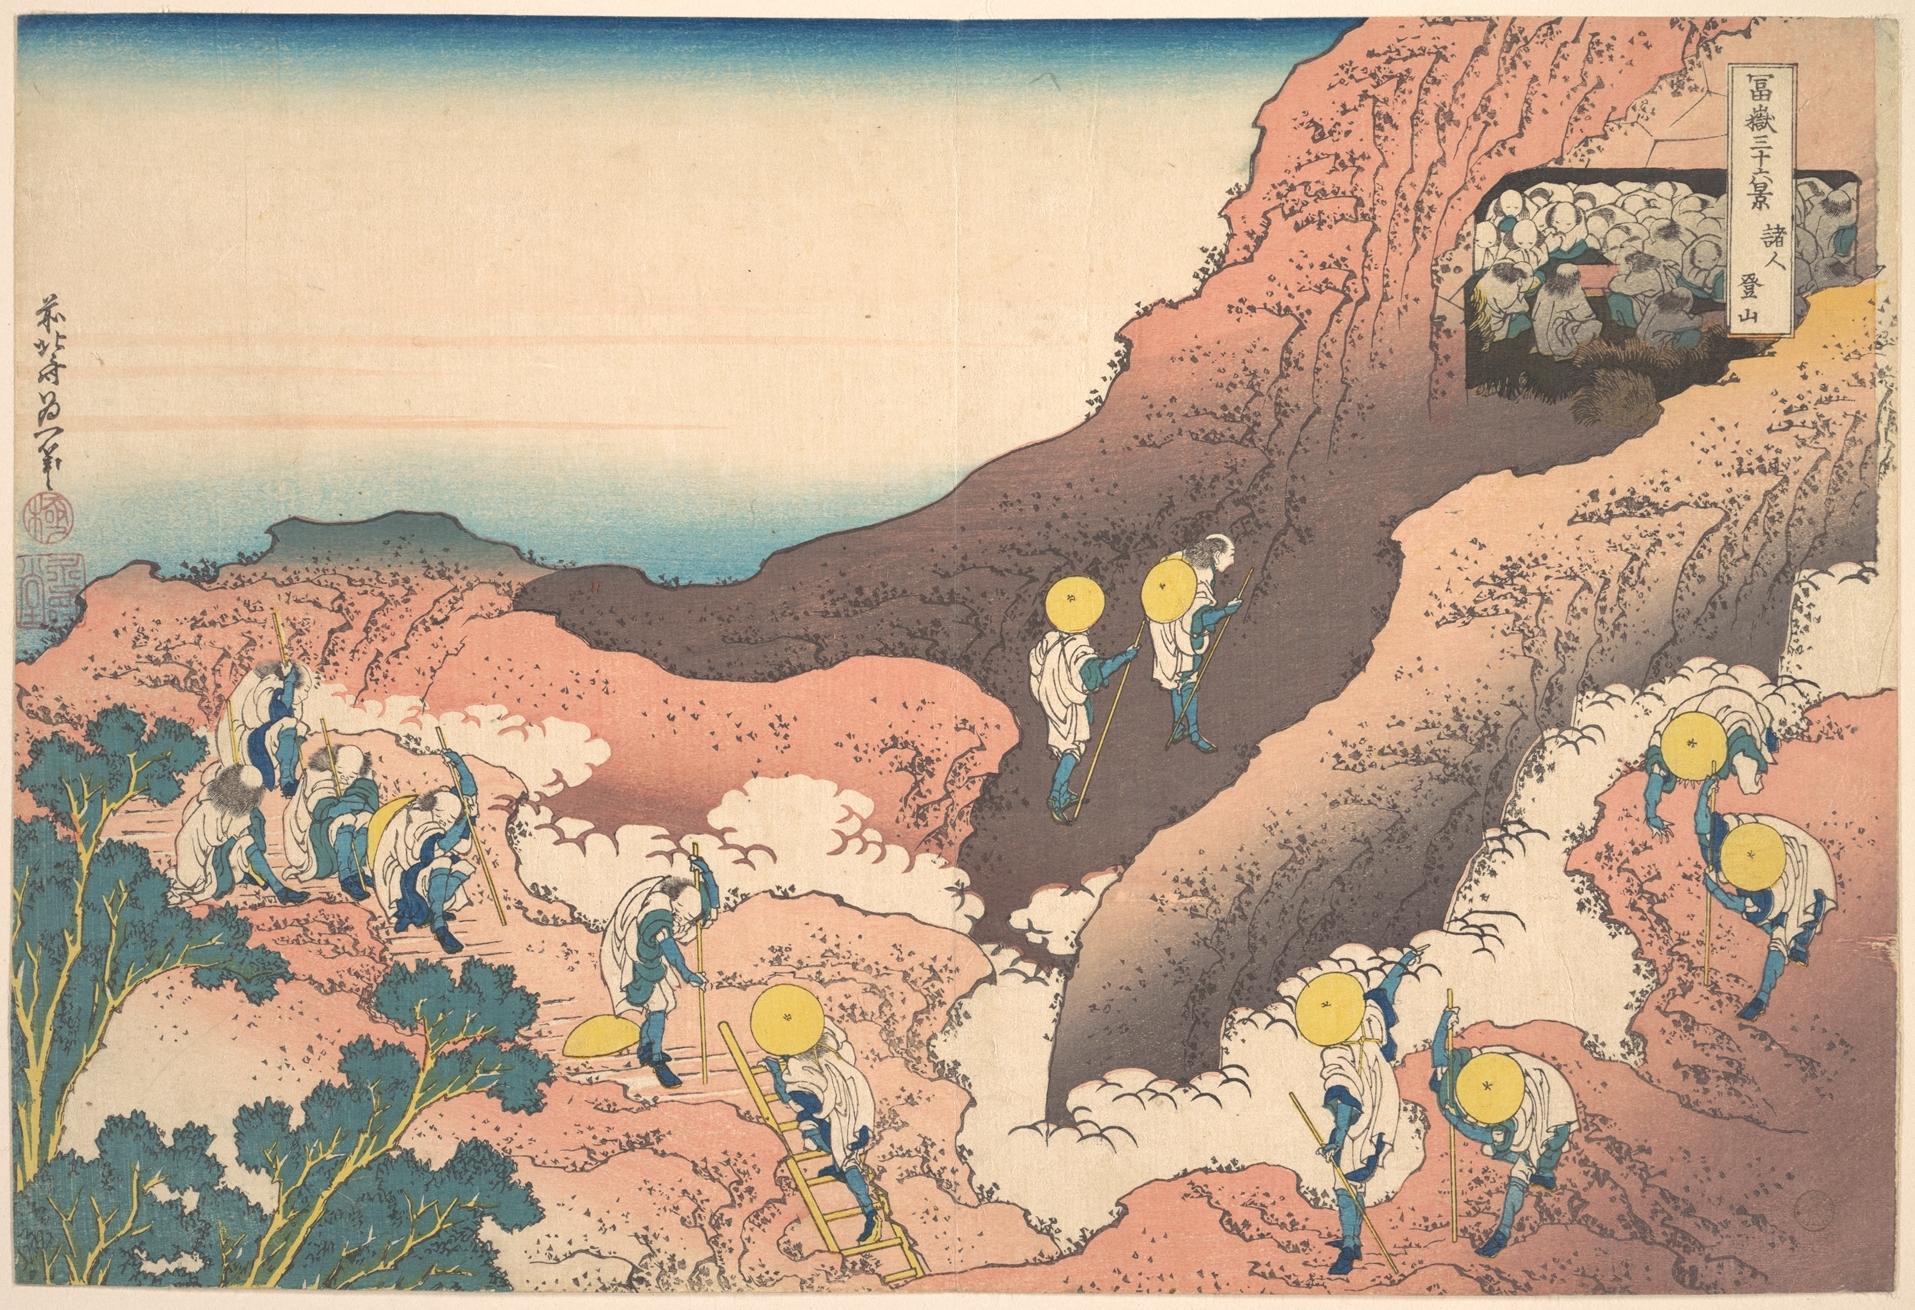 Shojin Tozan (Groups of Mountain Climbers). 1830-32 - Katsuhika Hokusai